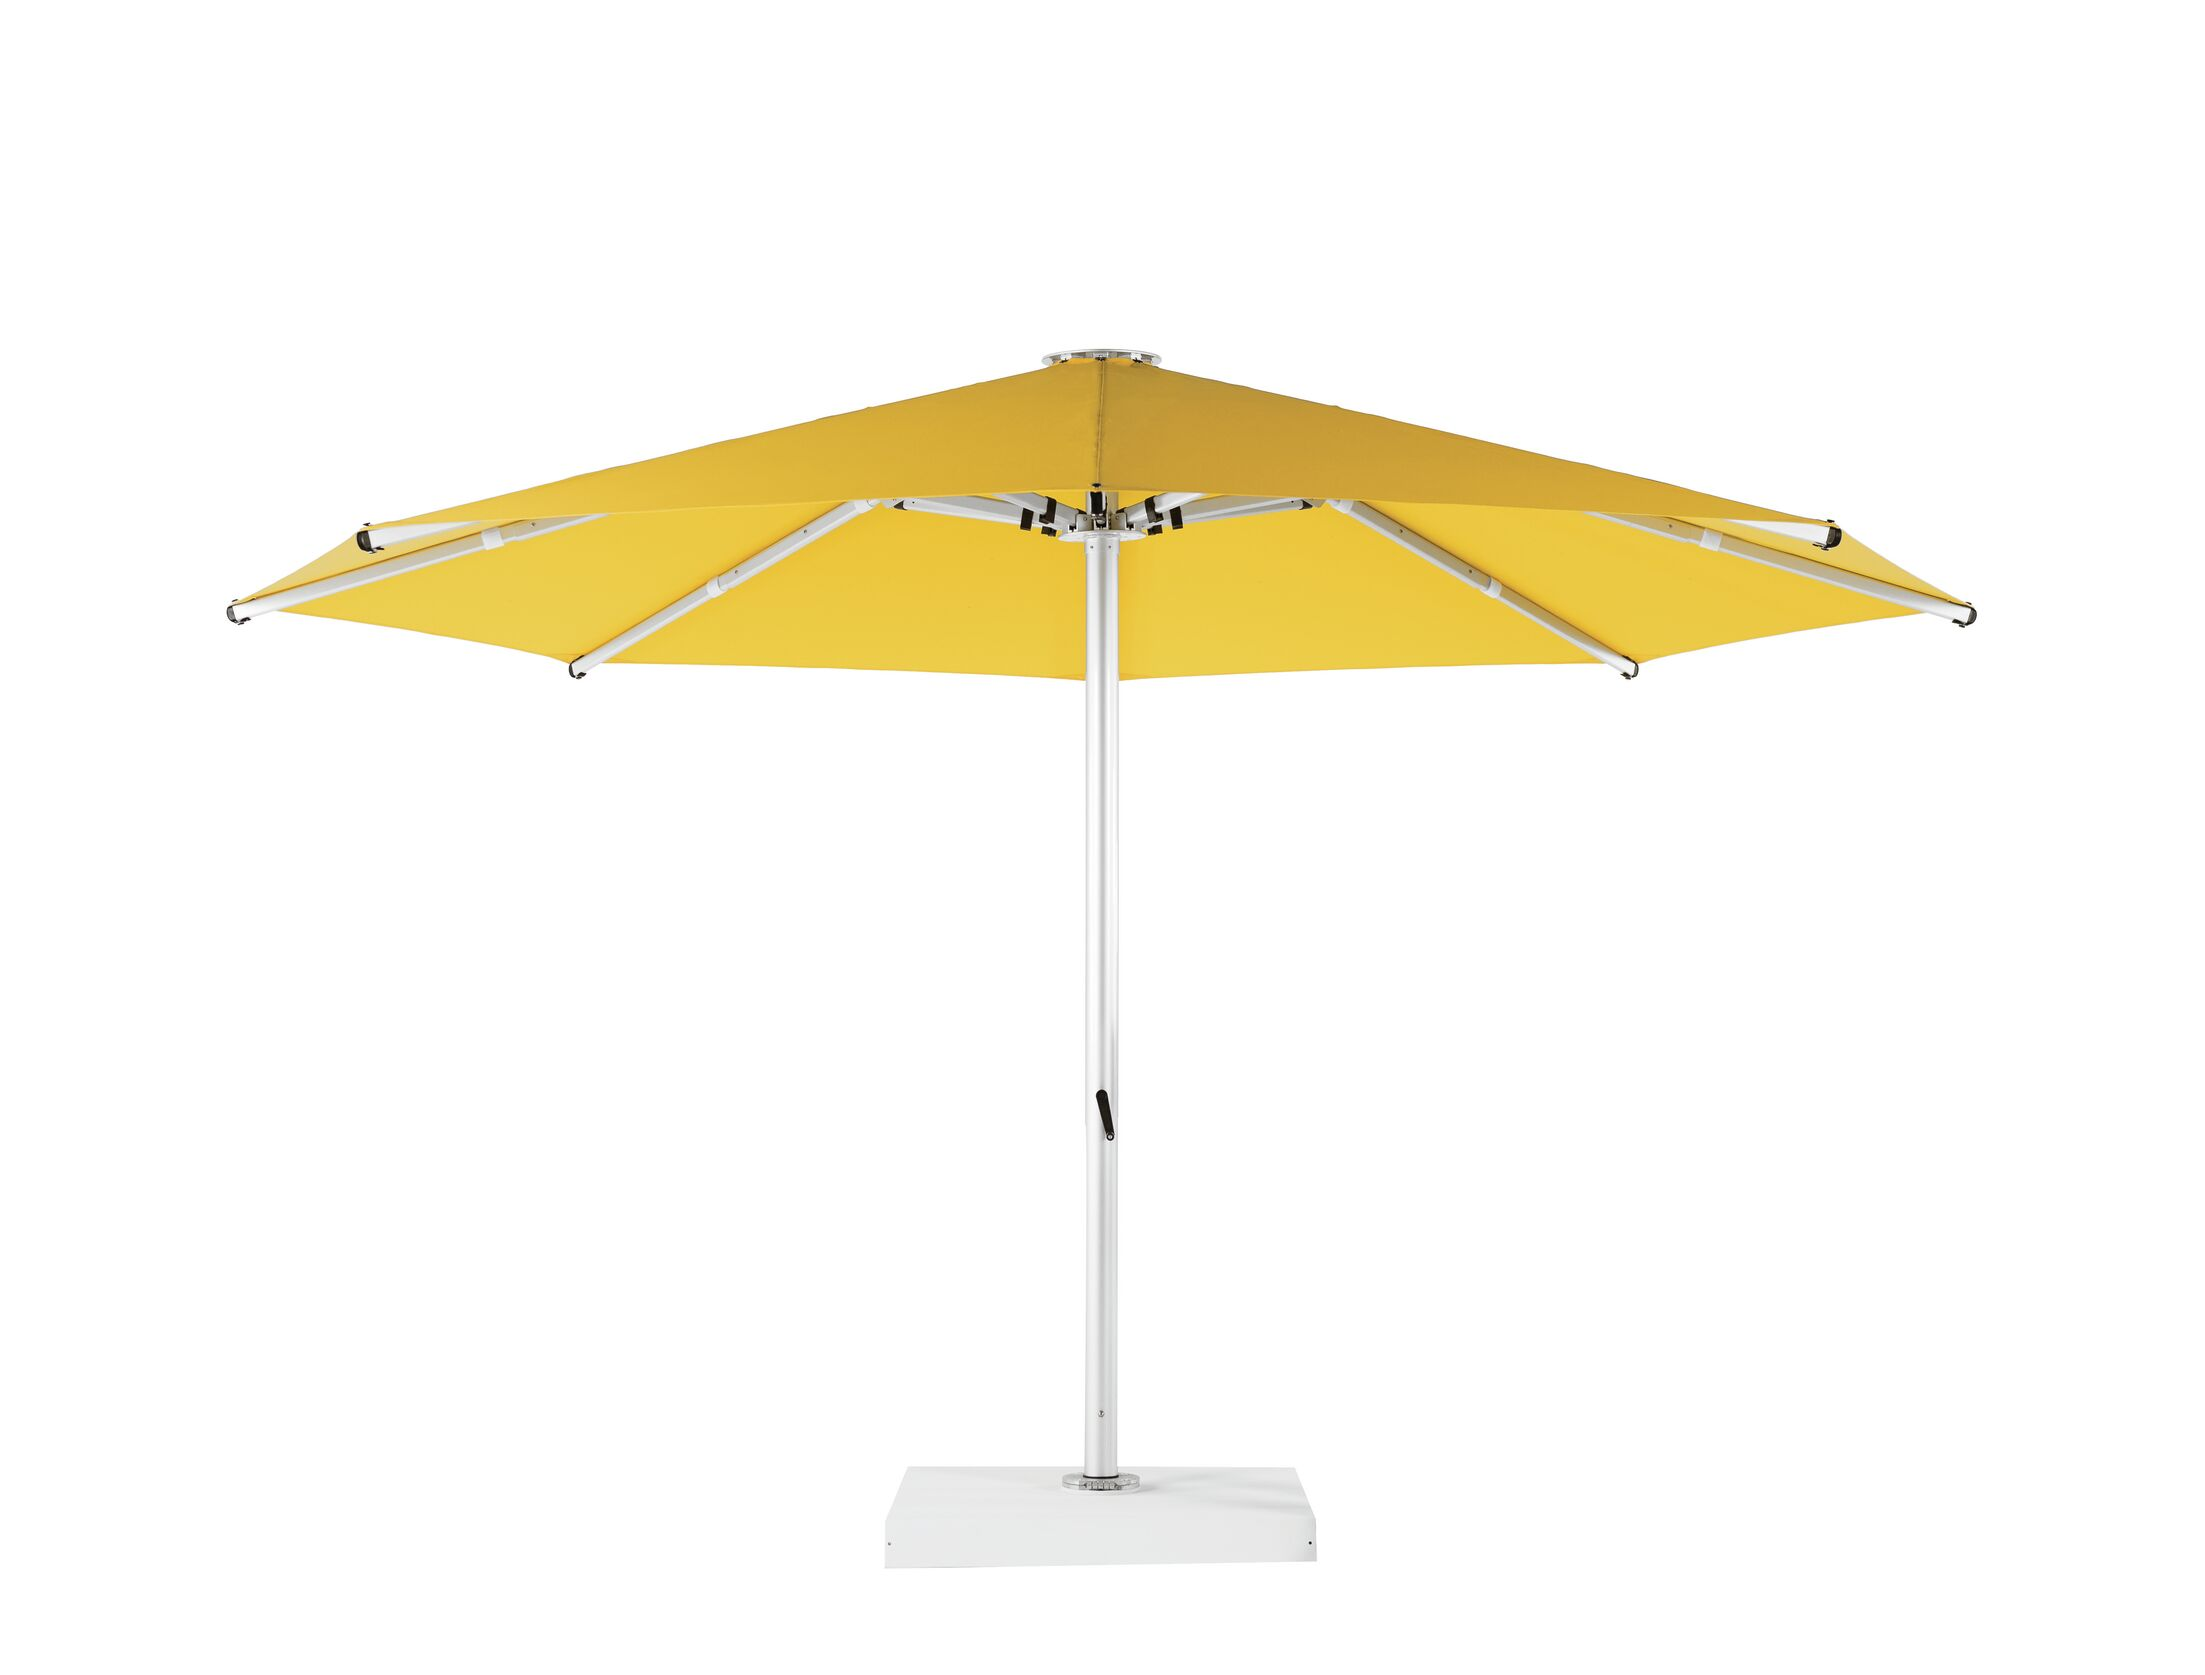 Nova 16' Market Umbrella Color: Sunflower Yellow